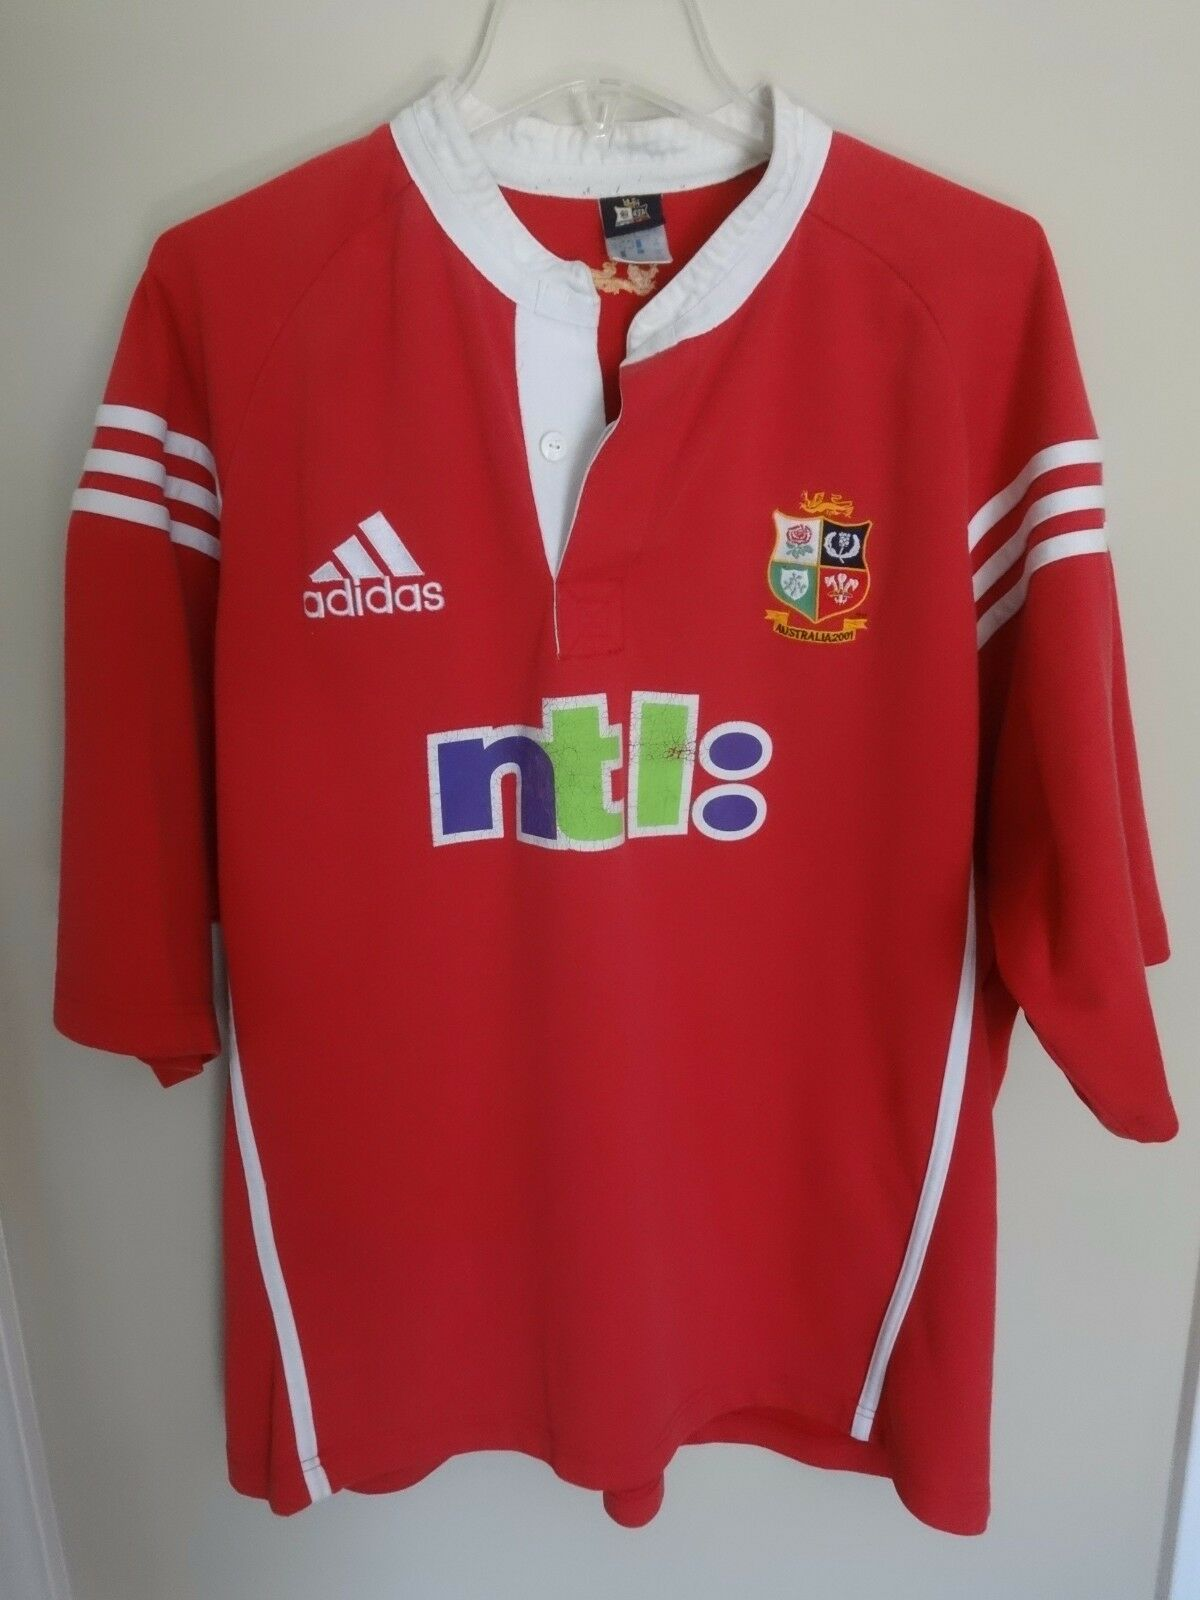 Vintage Adidas britannique & amp;Irish Lions 2001 SS Rugby Jersey Tour d Australie - Hommes 2XL